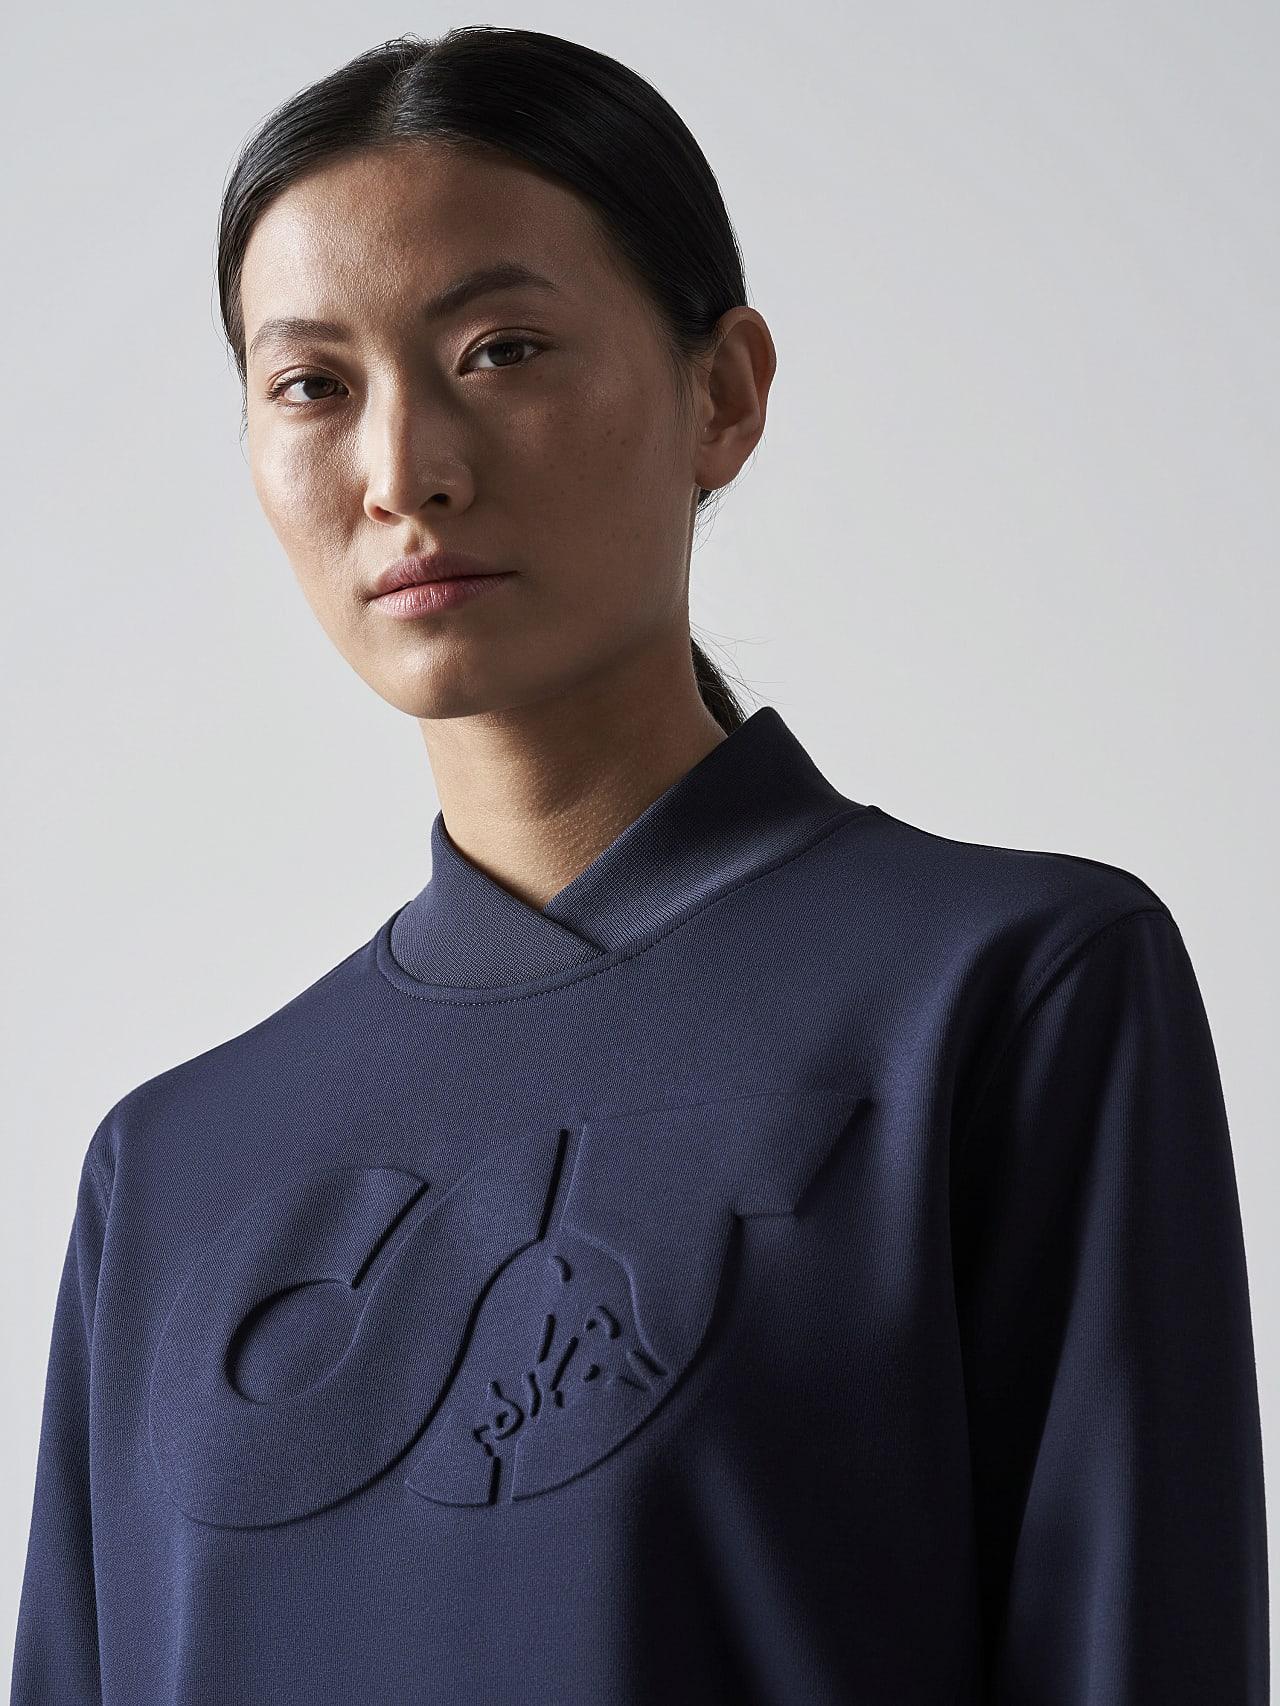 STAR V3.Y5.02 Premium Logo Sweater Dress navy Right Alpha Tauri